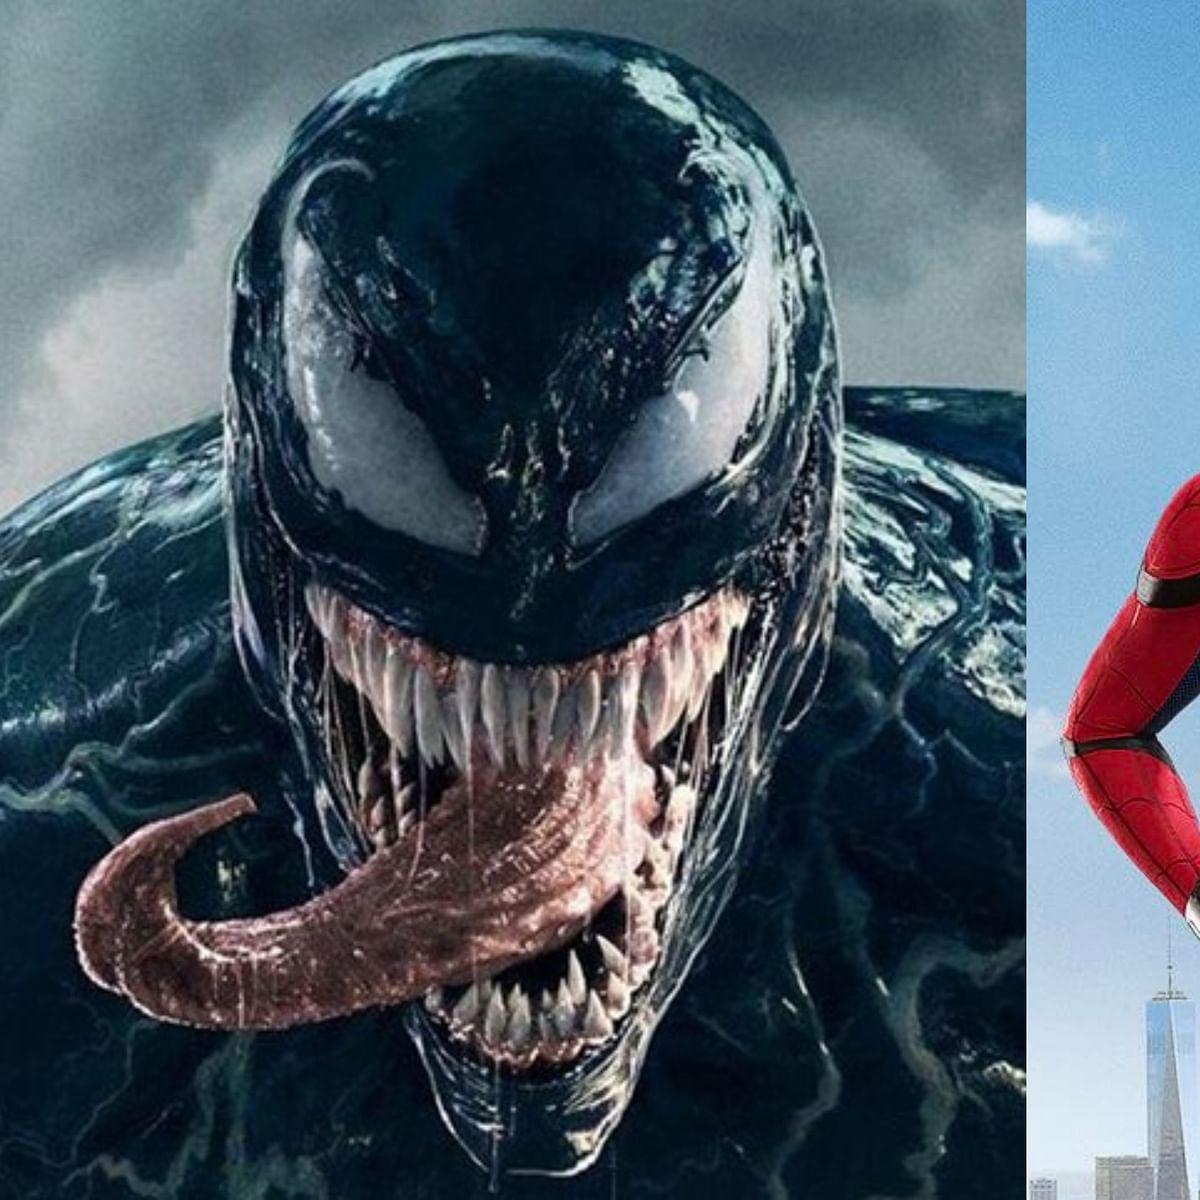 Spider-Man, Venom will 'confront each other' in the future